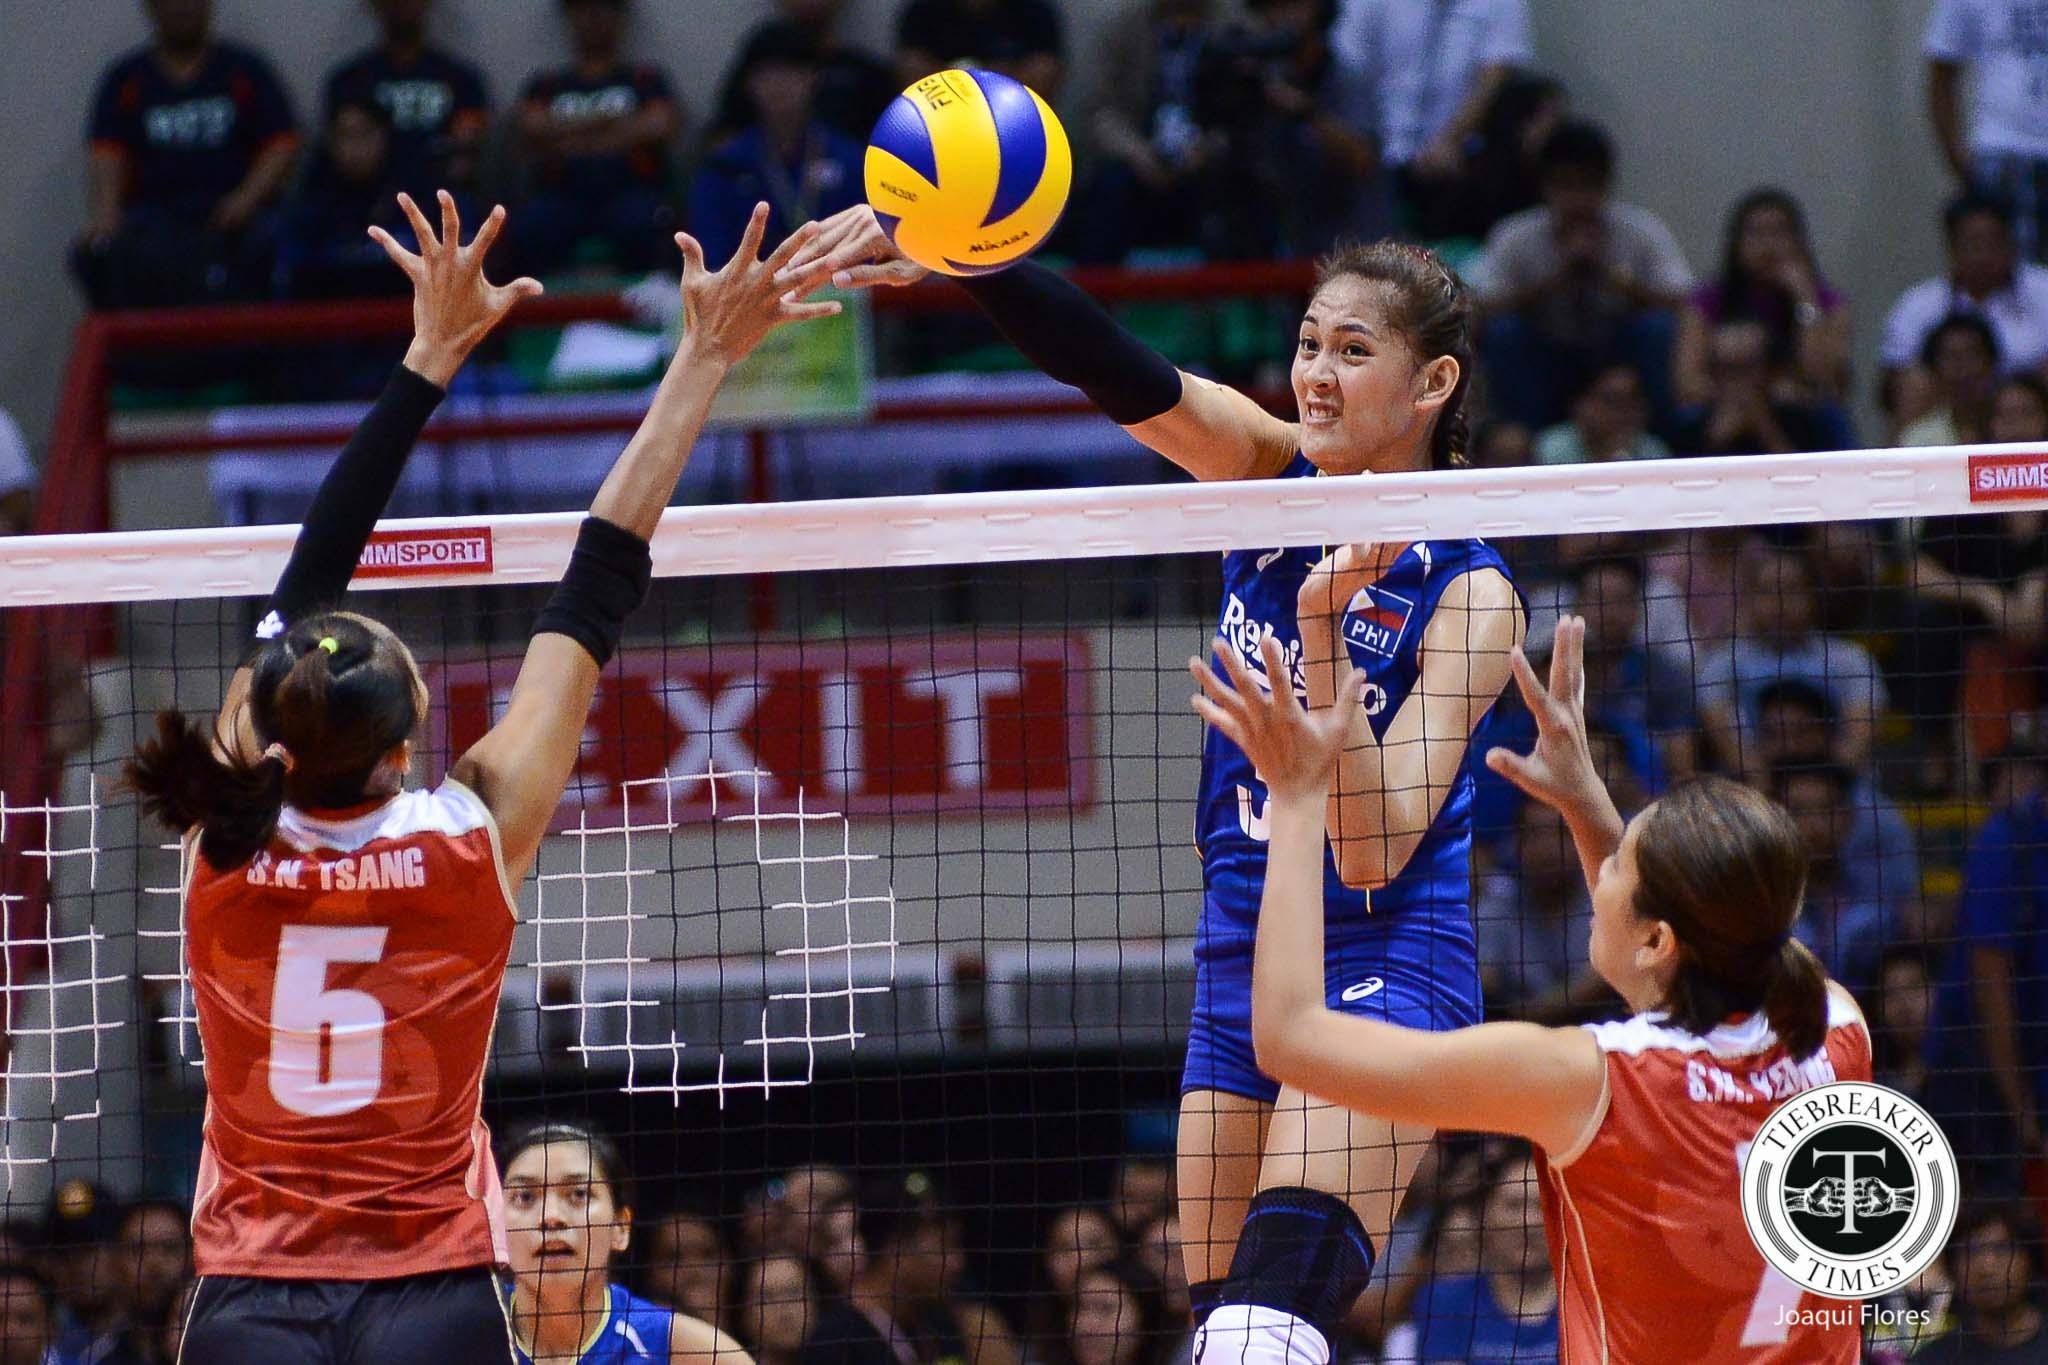 AVC-Seniors-Philippines-vs.-HKG-Santiago-2995 Santiago, Bagunas, Espejo to miss AVC club tourneys News Volleyball  - philippine sports news